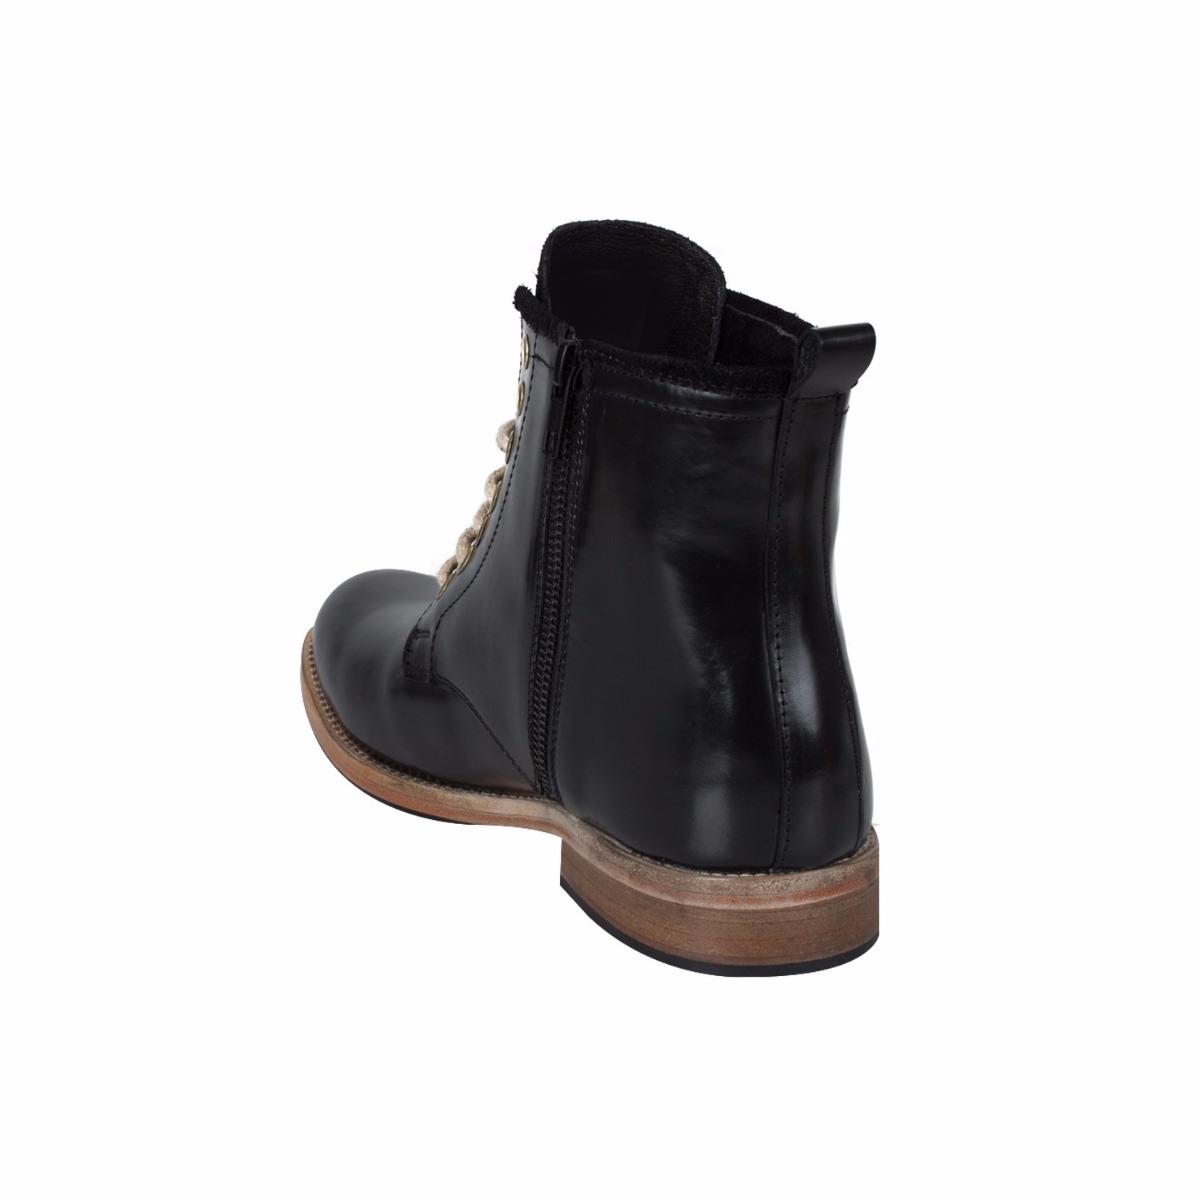 24a706a822 botas heavy goodyear negras de piel para caballero id 112. Cargando zoom.